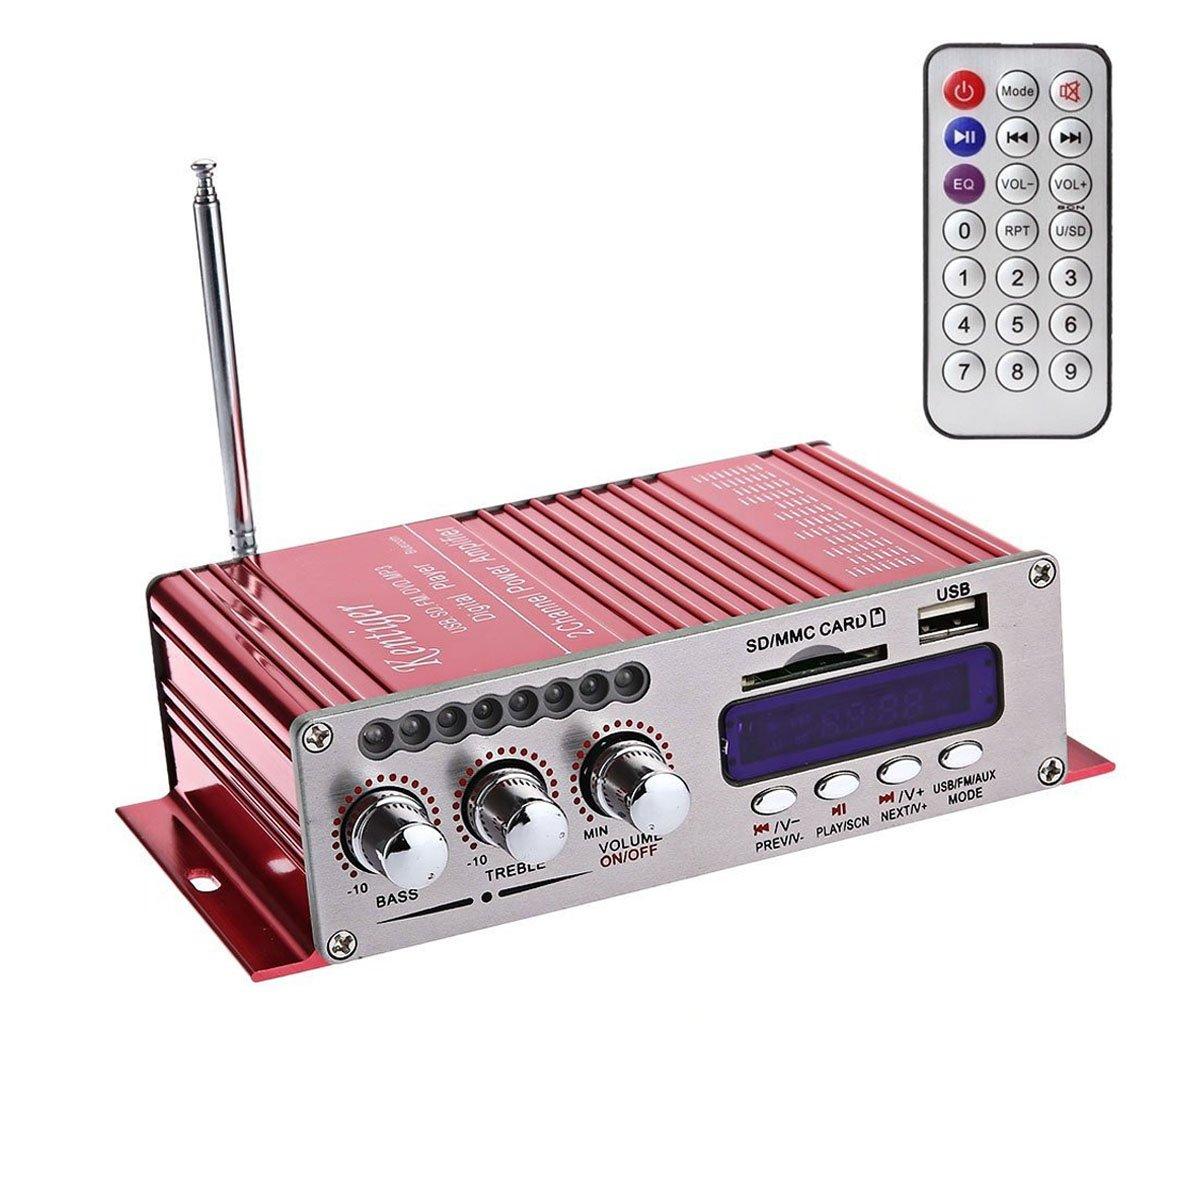 WINGONEER 12V Hi-Fi Stereo amplificador de audio digital de DVD USB SD FM estéreo audio MP3 de radio del coche del altavoz de Bluetooth Amplificador: ...